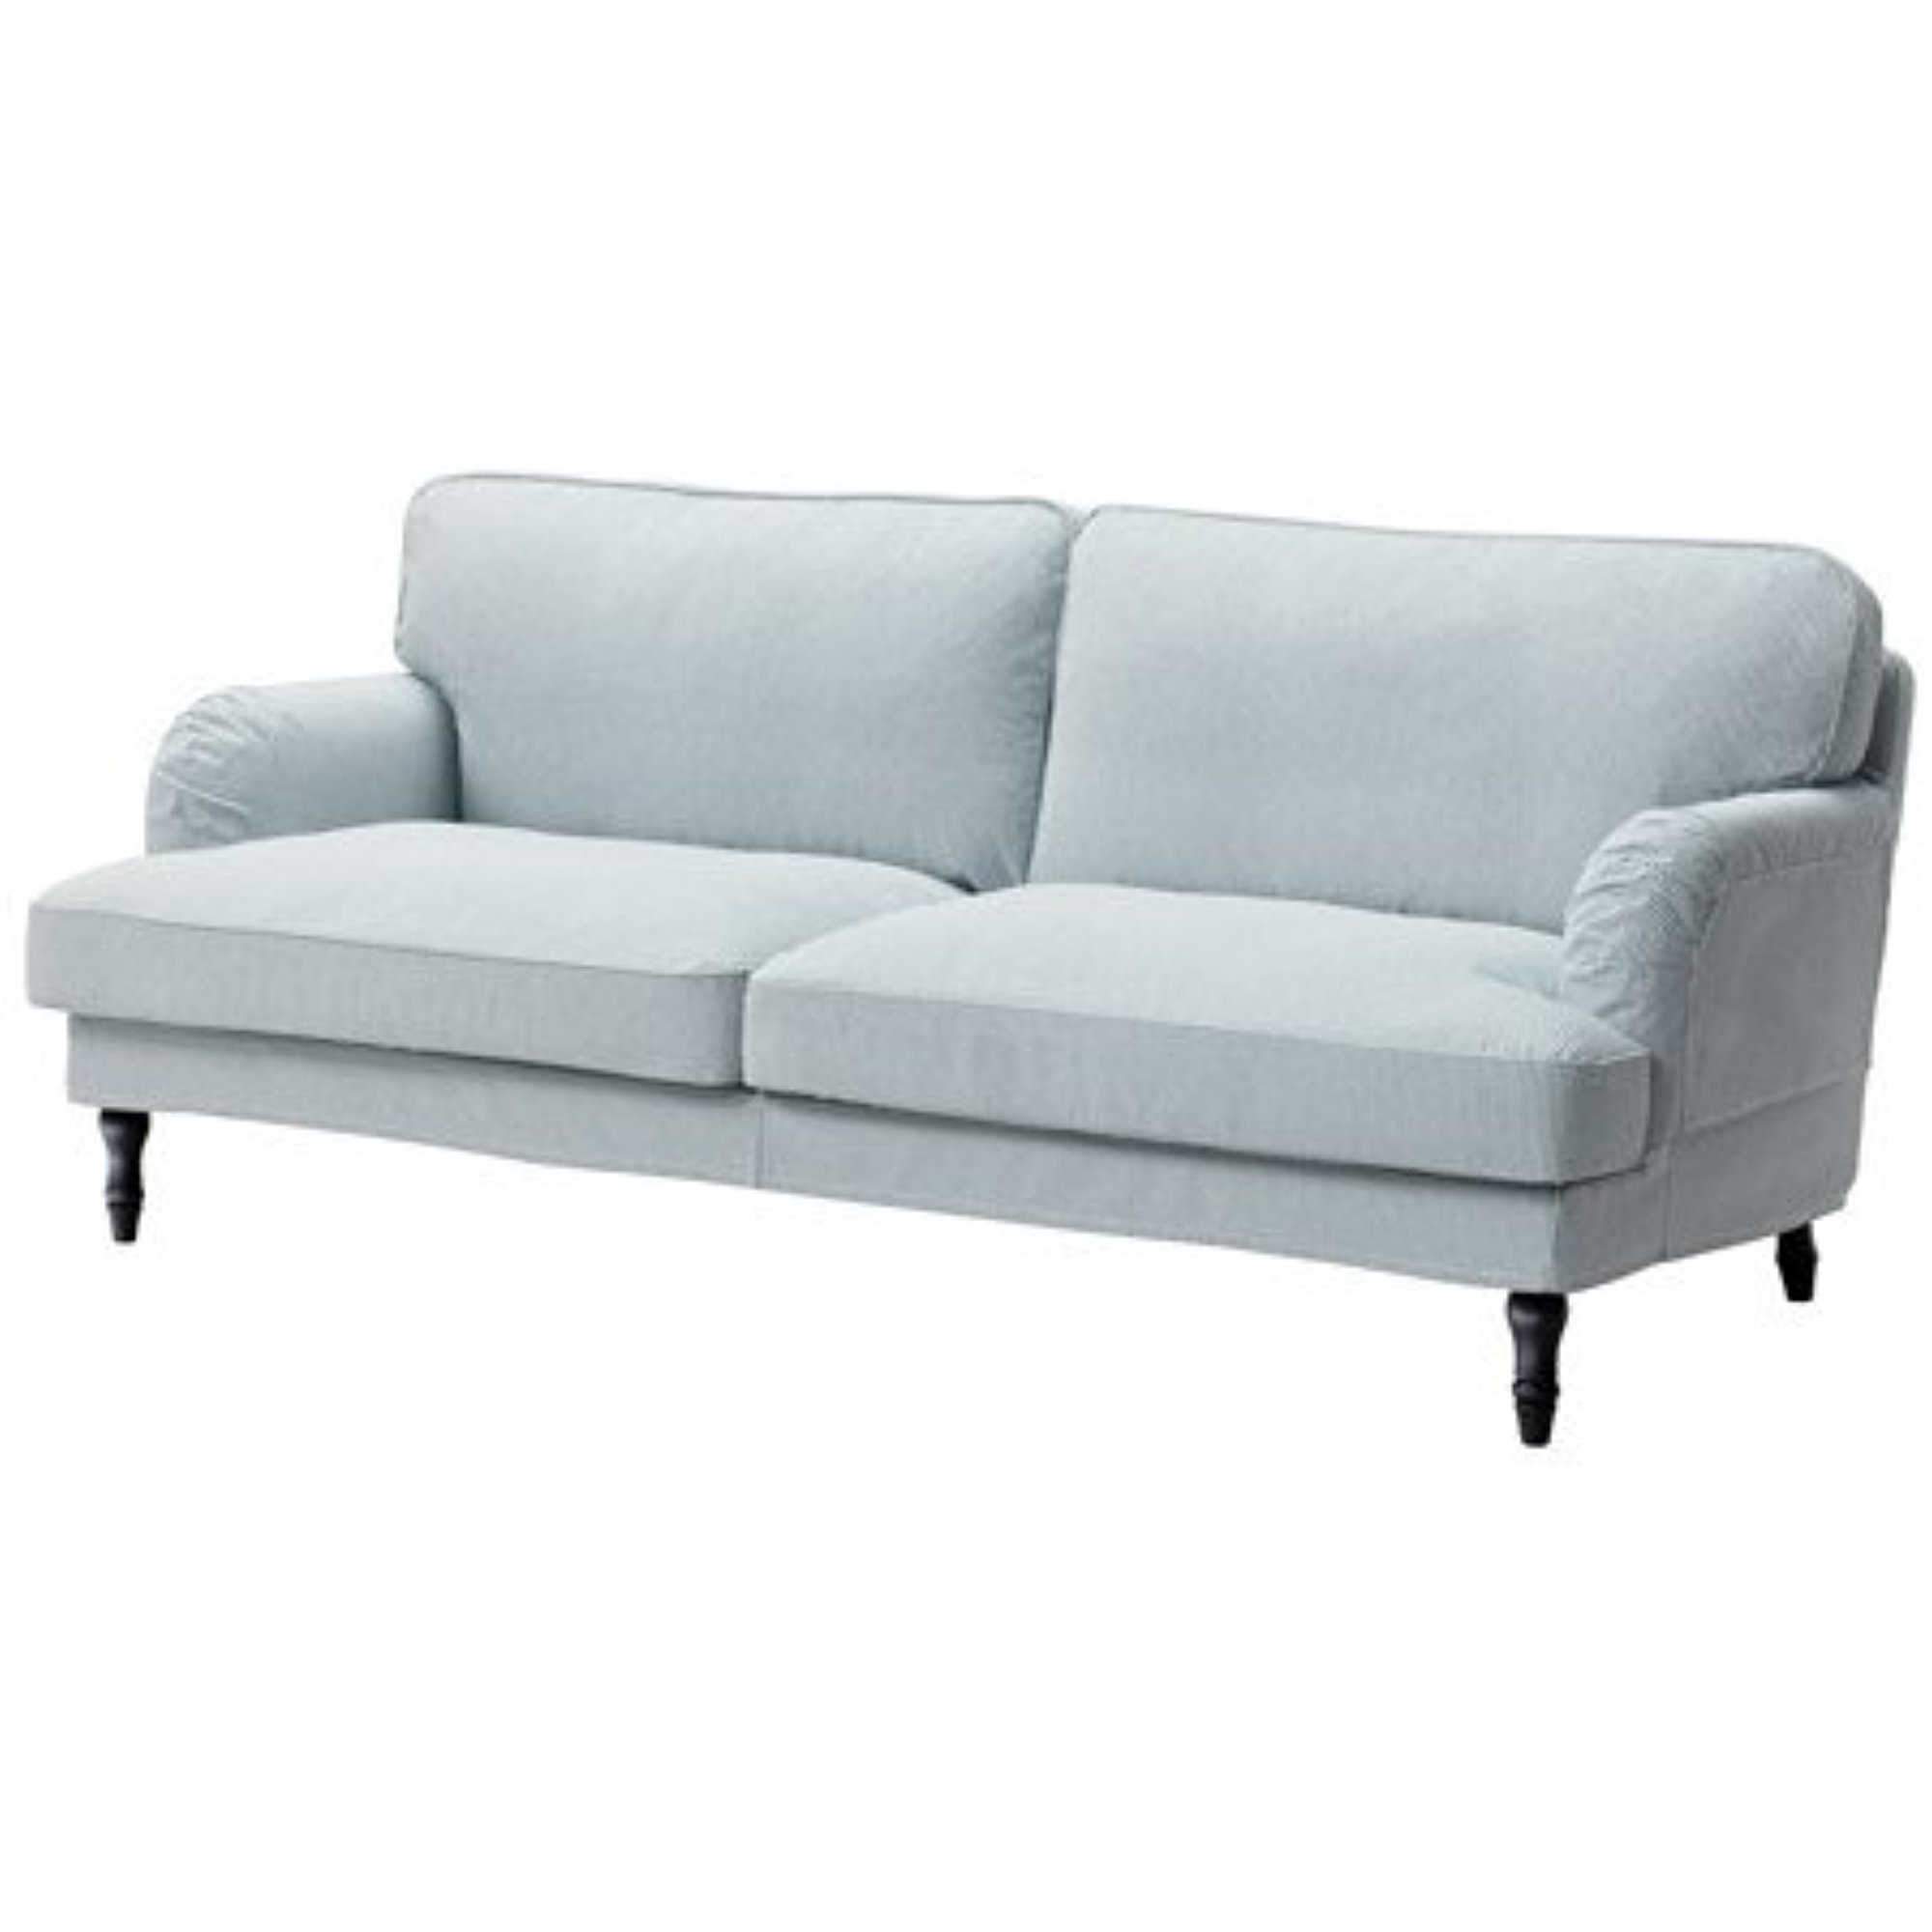 Ikea Sofa Remvallen Blue White Black Wood 10204 82926